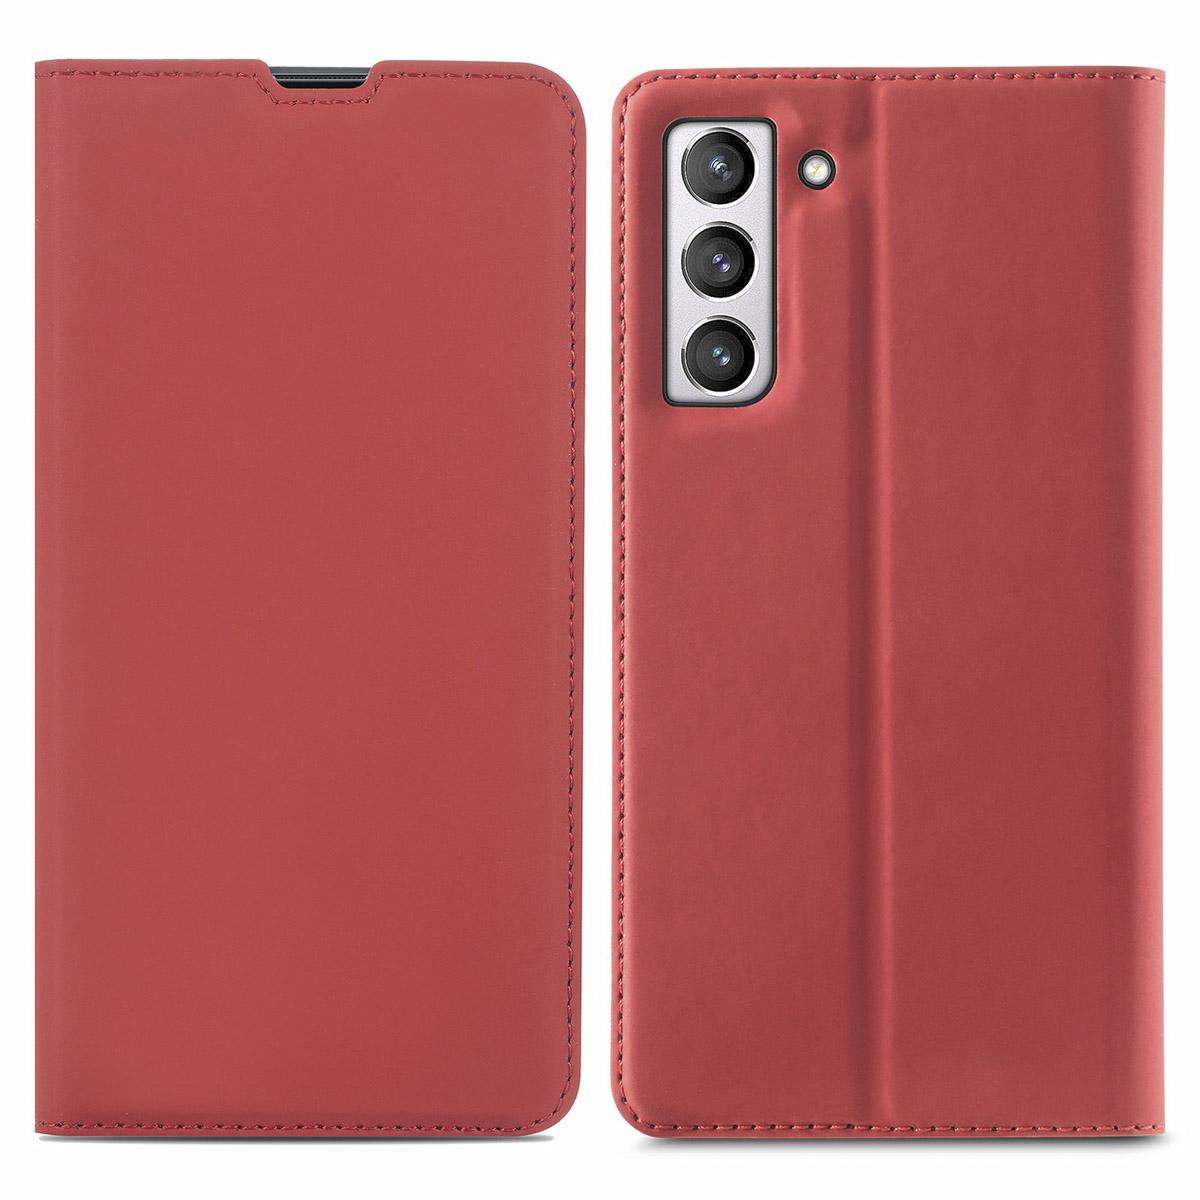 iMoshion Slim Folio Booklet Samsung Galaxy S21 FE - Rot